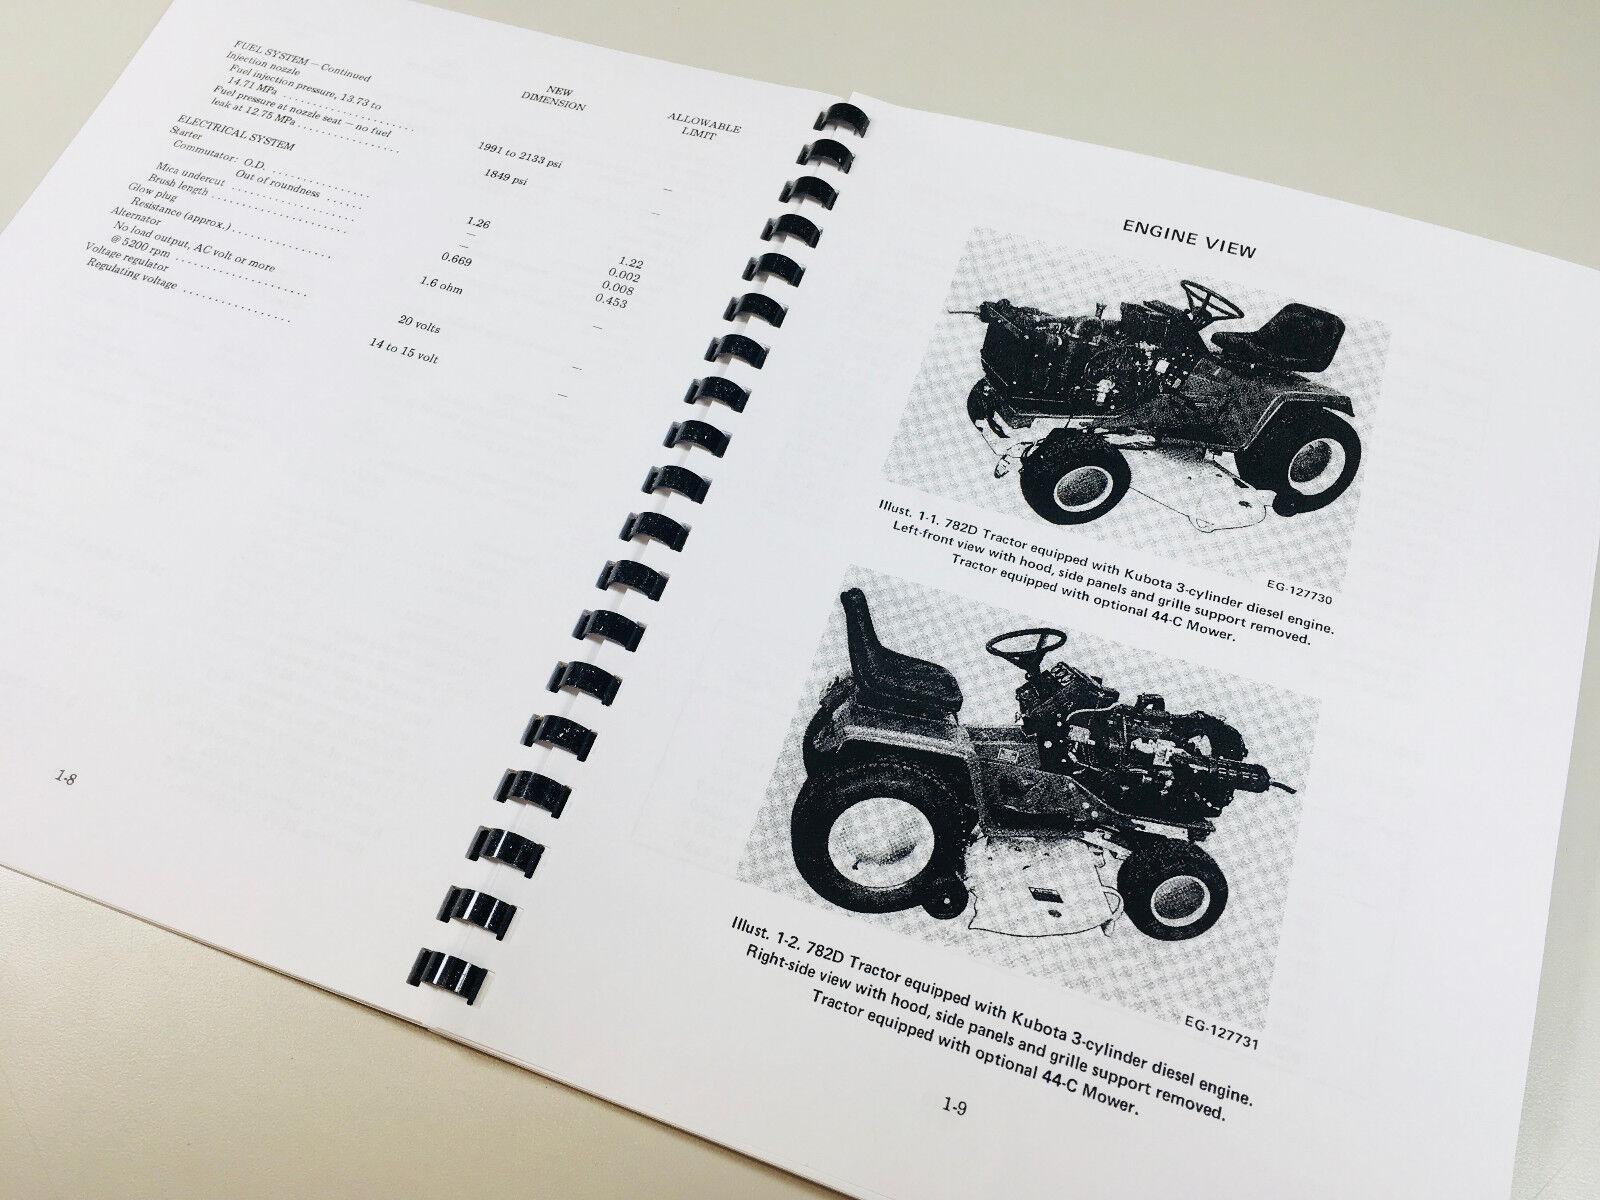 ... manuals rh picturelights club Array - kubota g5200 garden tractor  diesel engine electrical service manual rh ebay com